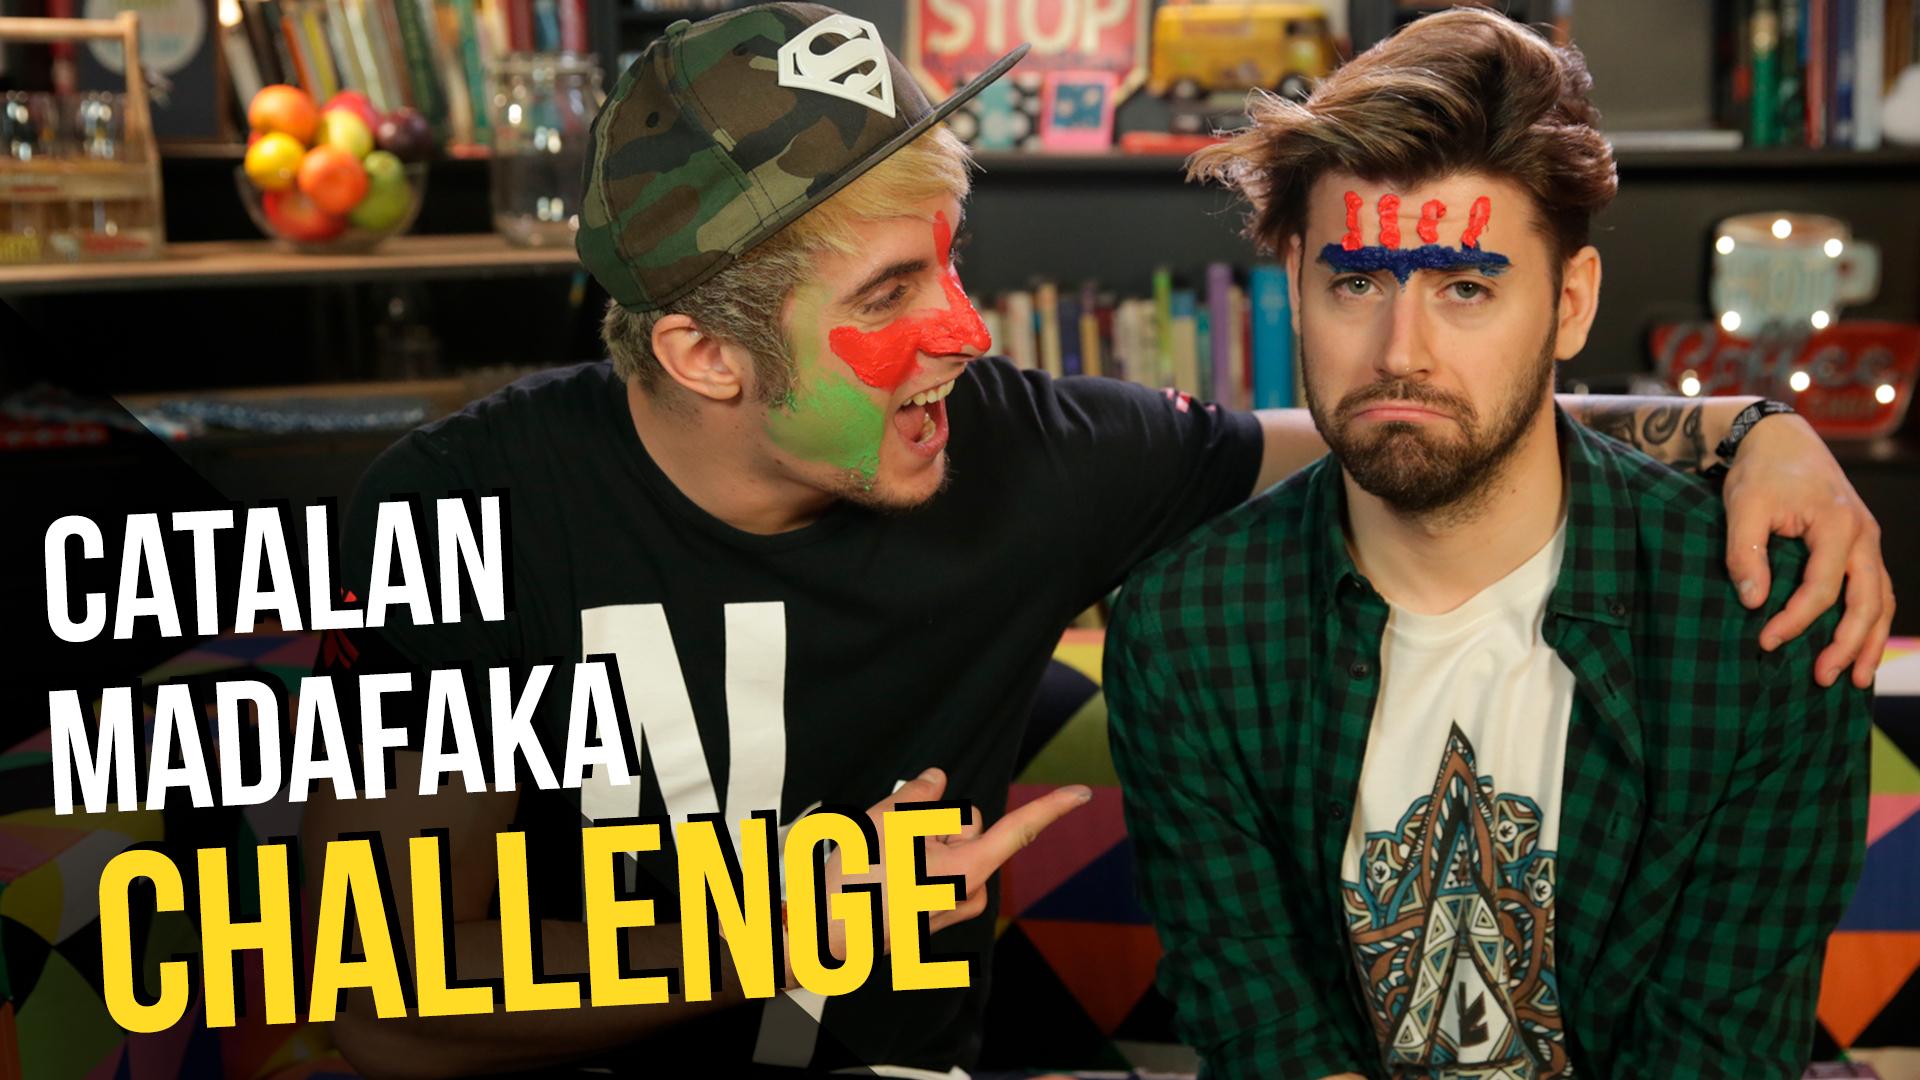 Temporada 1 CATALAN MADAFAKA CHALLENGE